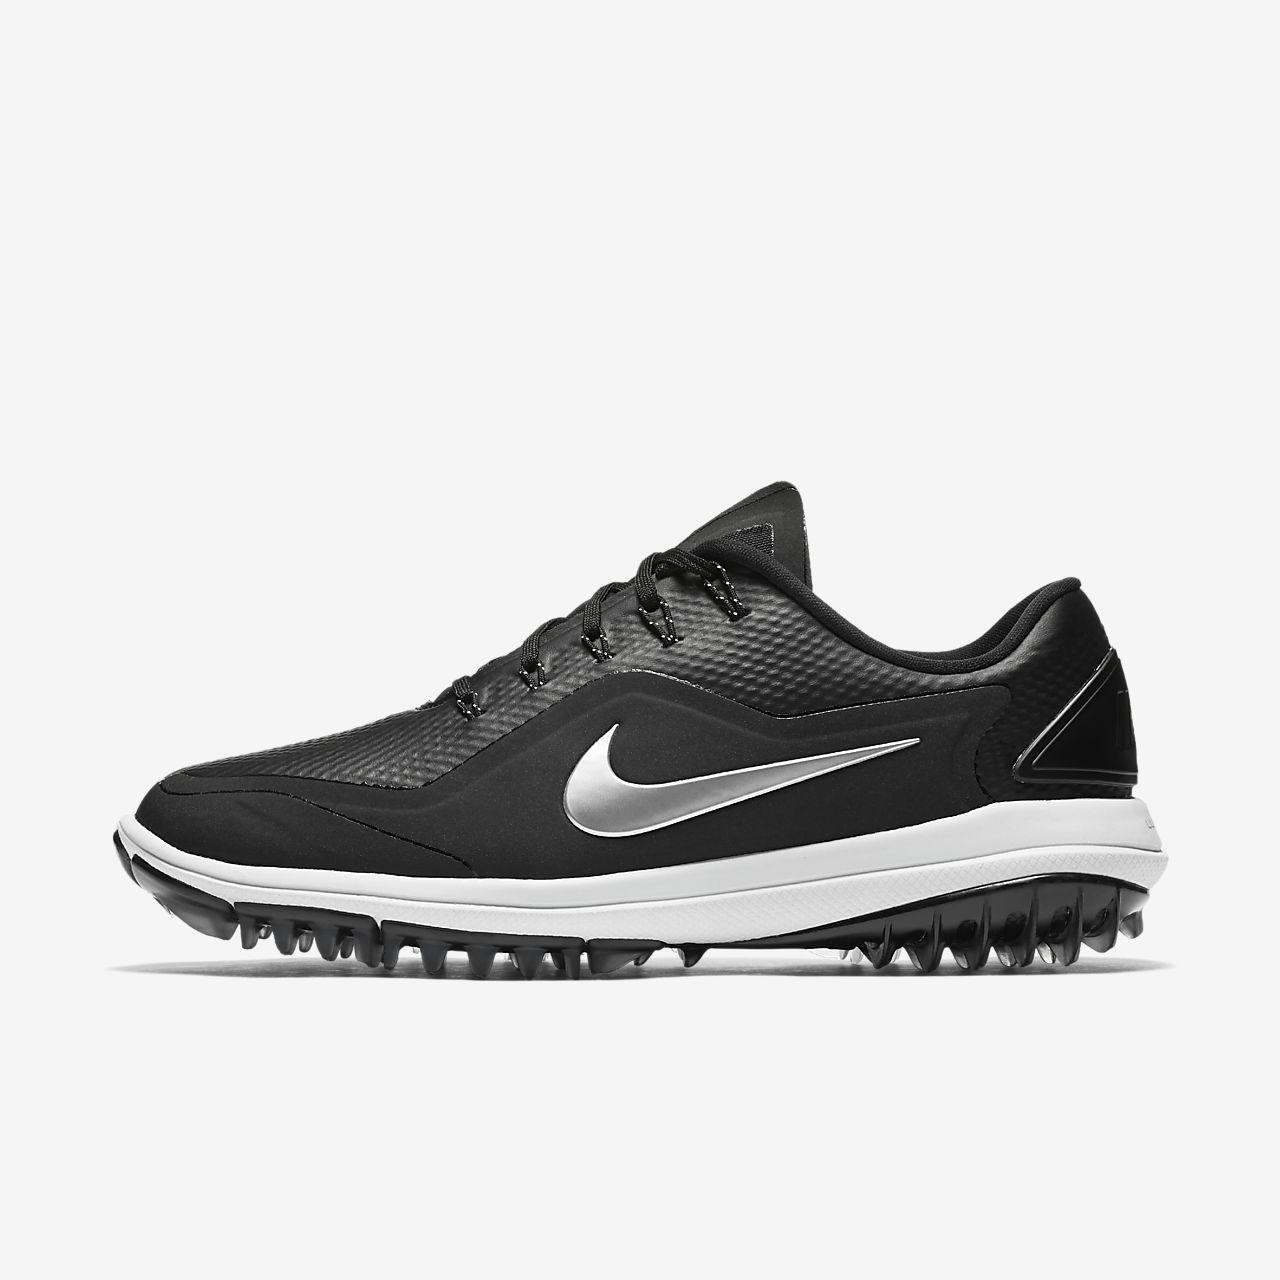 Nike Lunar Control Vapor 2 Sabatilles de golf - Dona